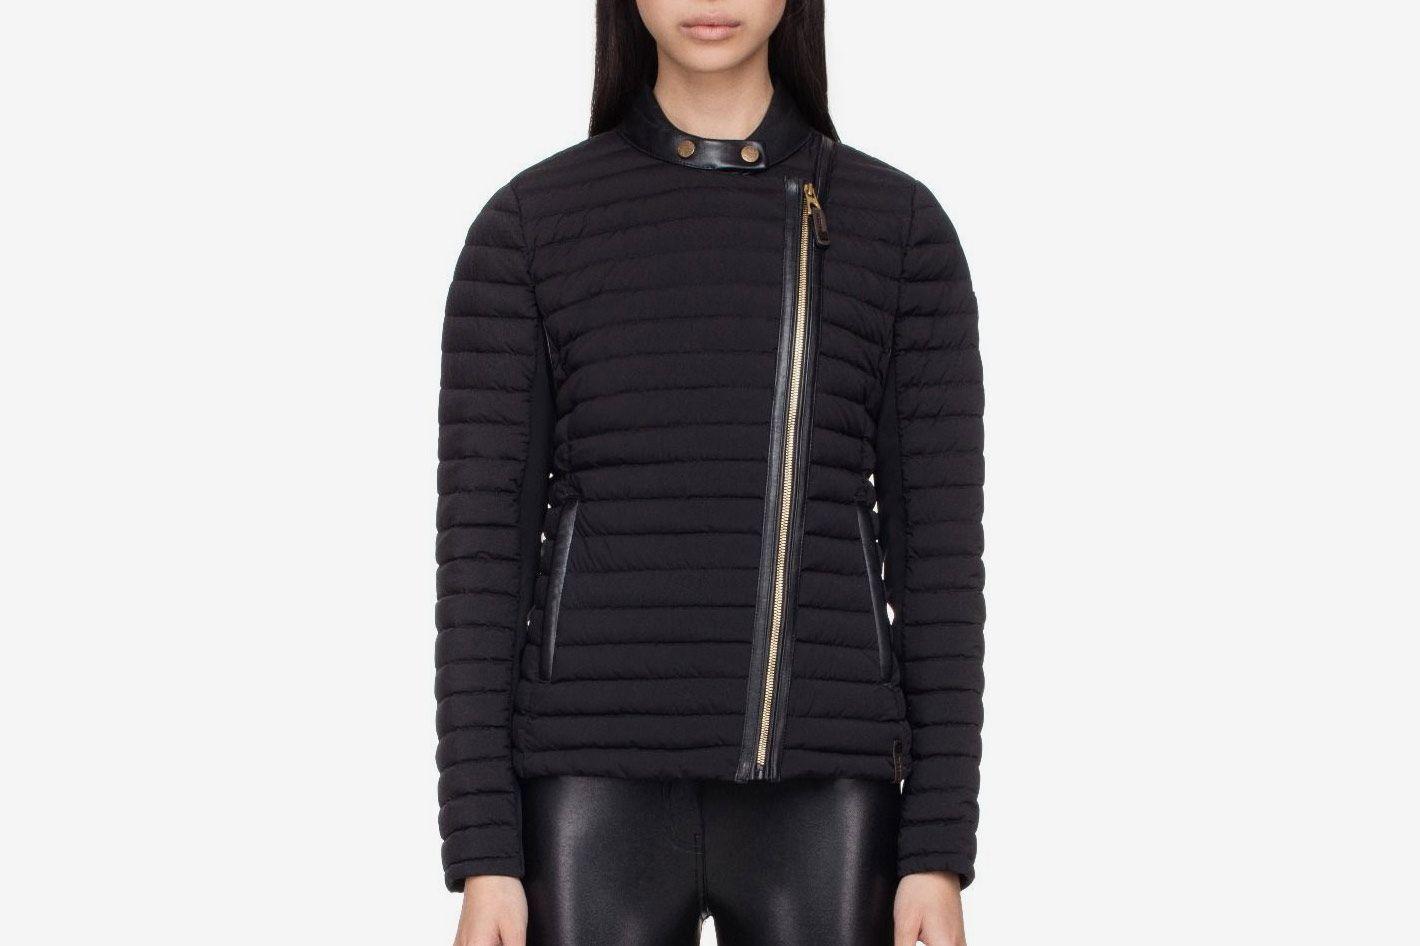 Rudsak Tanesha Lightweight Jacket